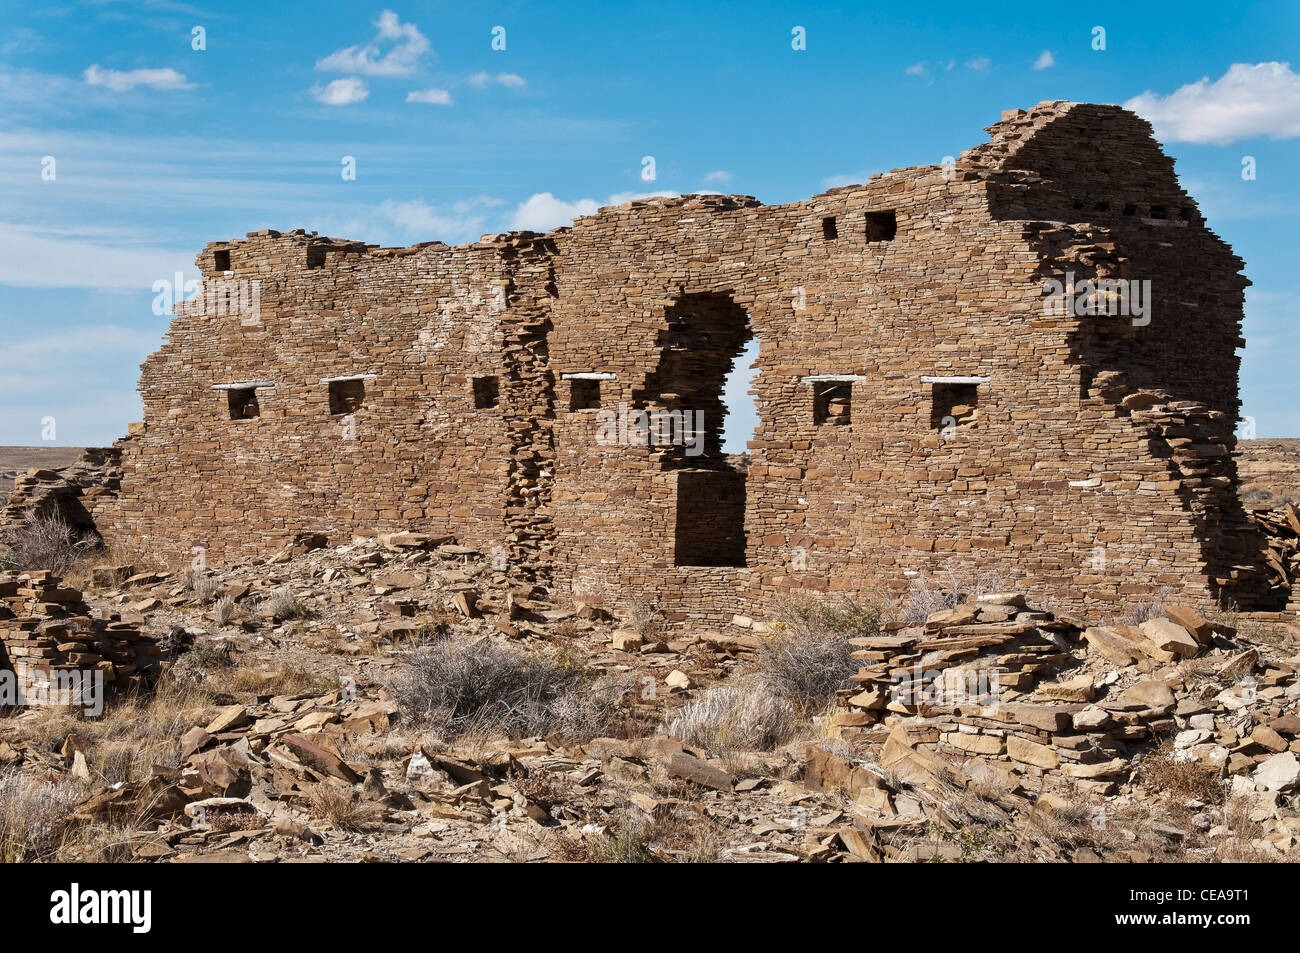 New mexico taos county penasco - Penasco Blanco Chaco Culture National Historical Park New Mexico Stock Image